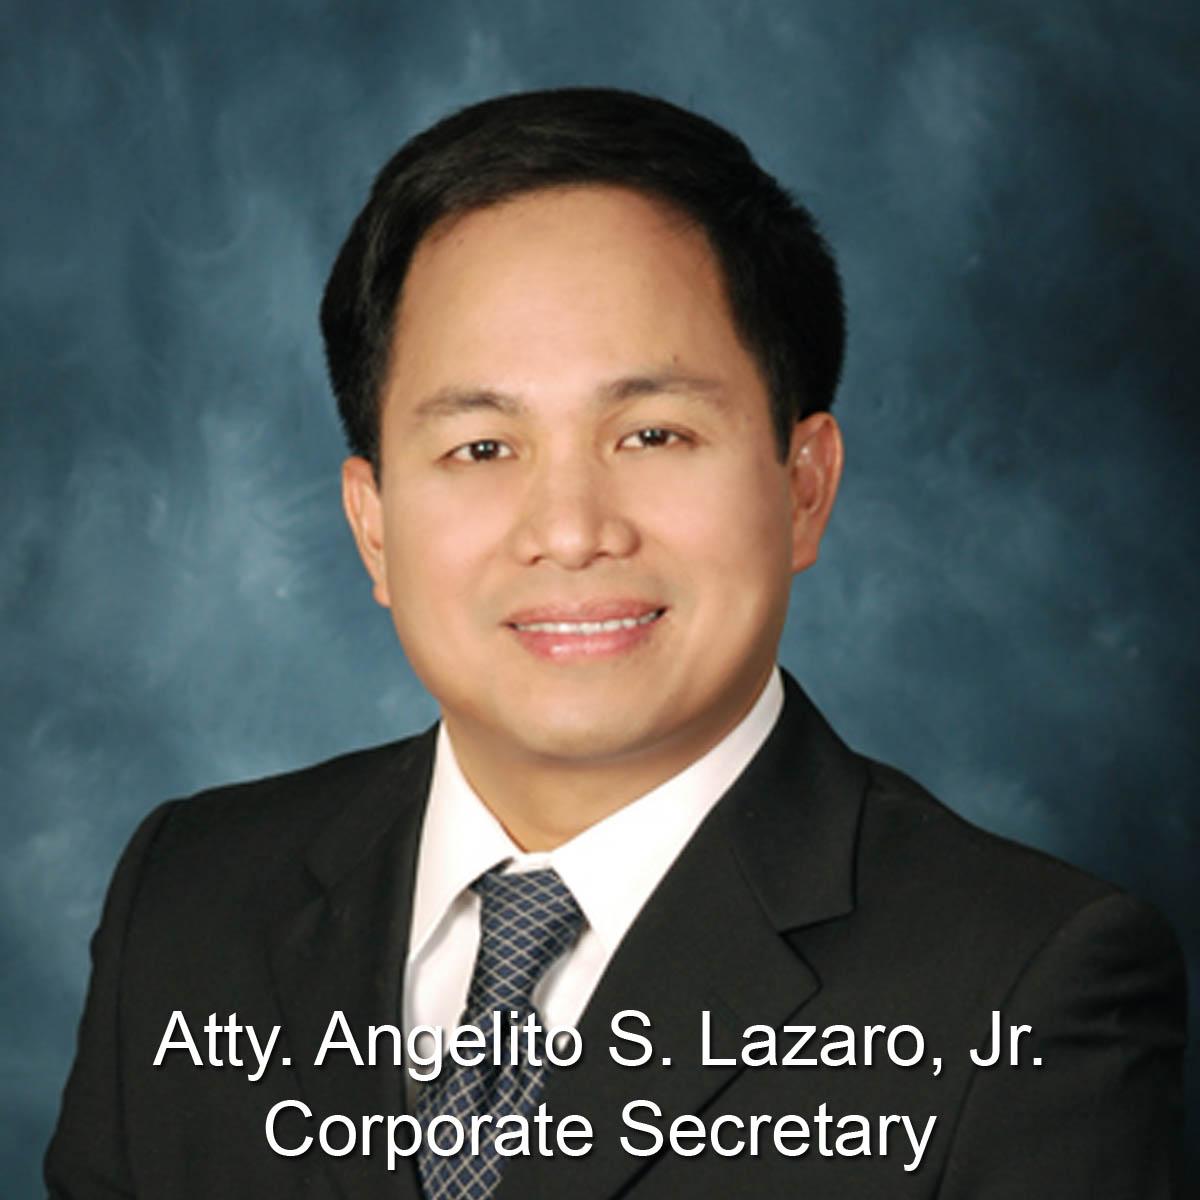 005AttyAngelitoLazaro_CorporateSecretary